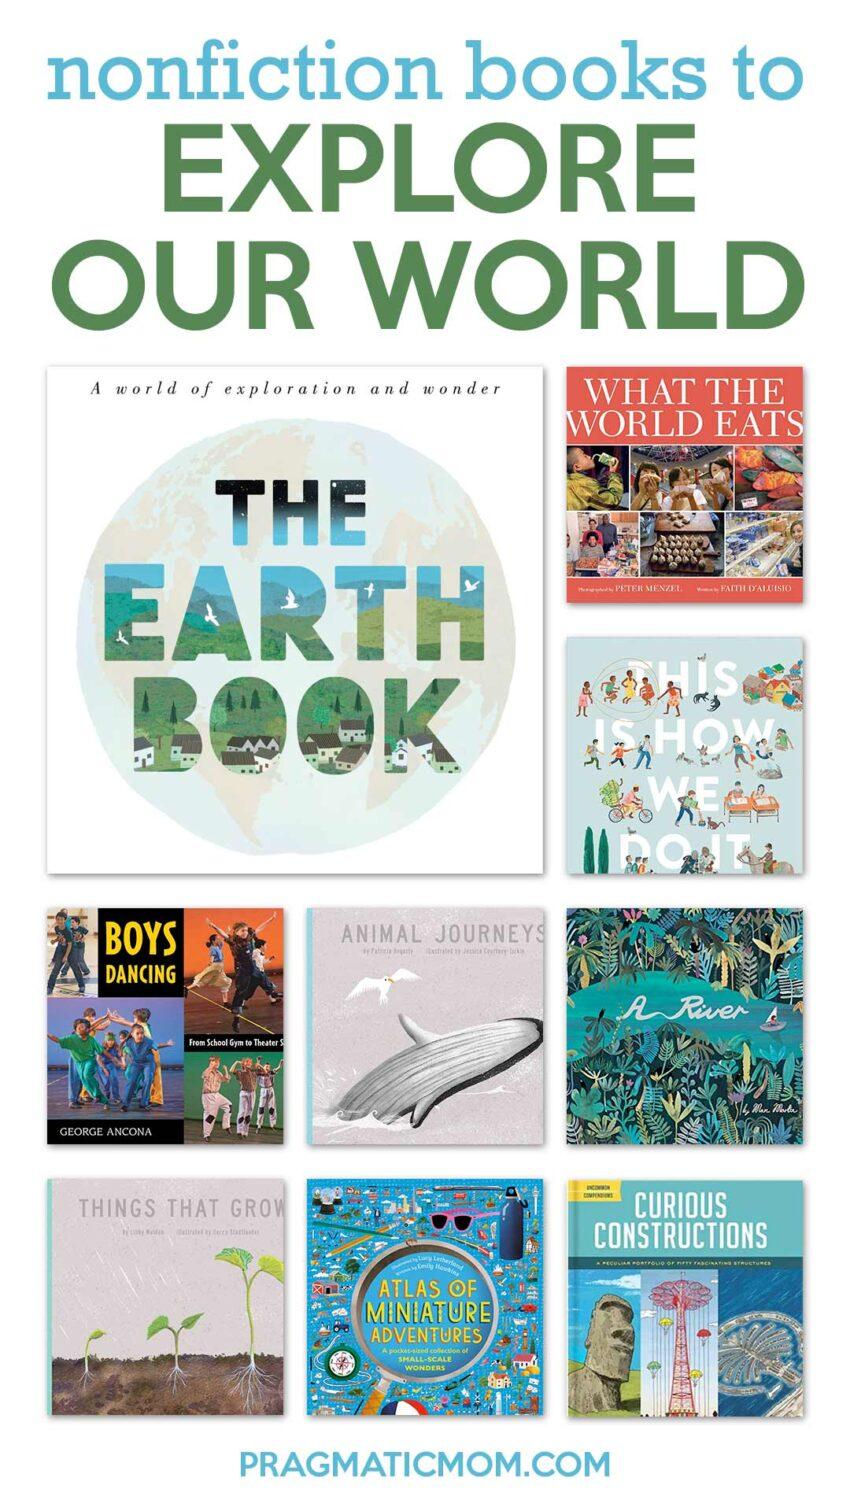 Nonfiction Books to Explore Our World